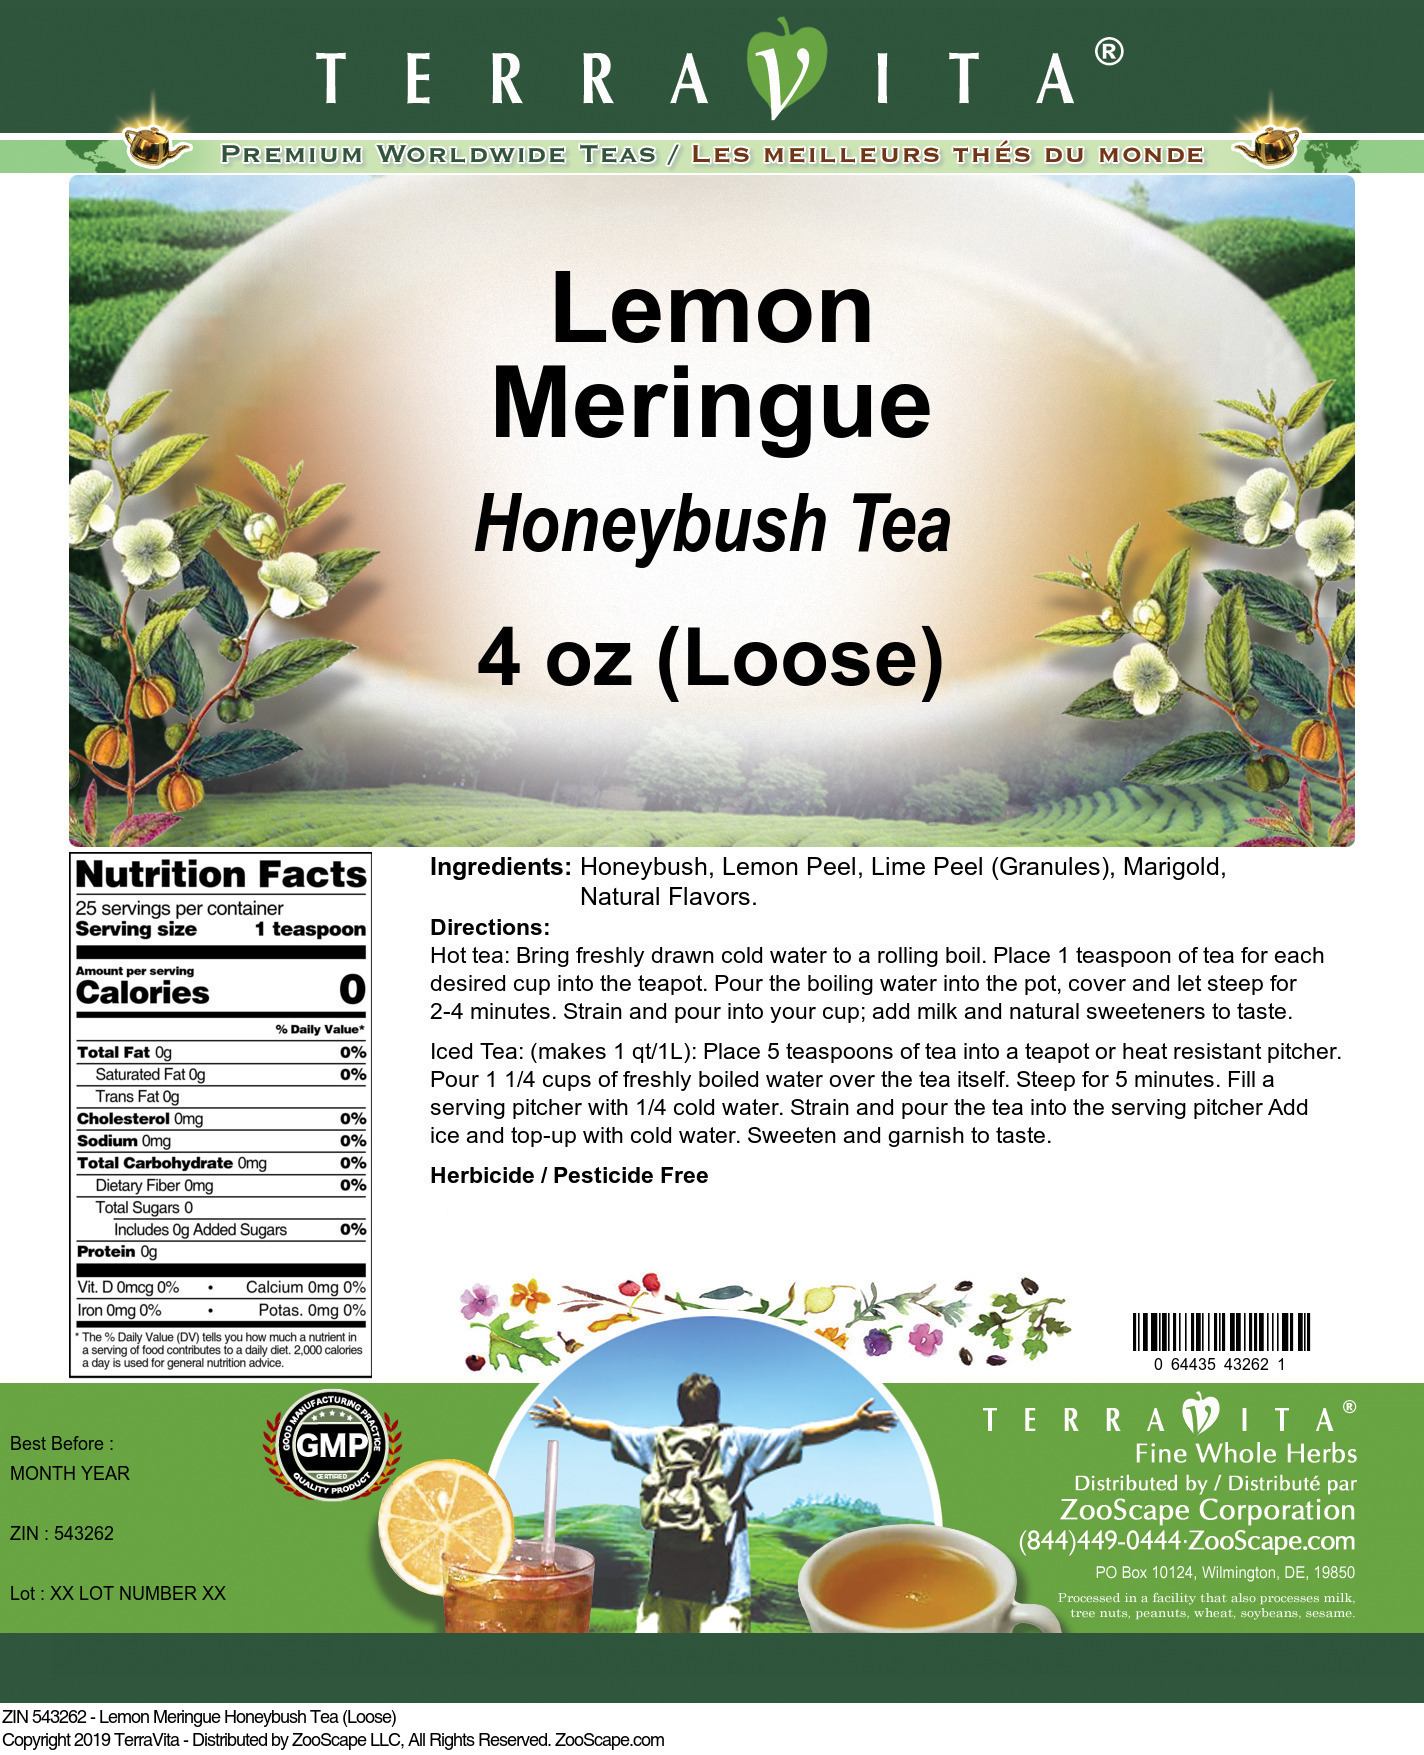 Lemon Meringue Honeybush Tea (Loose)